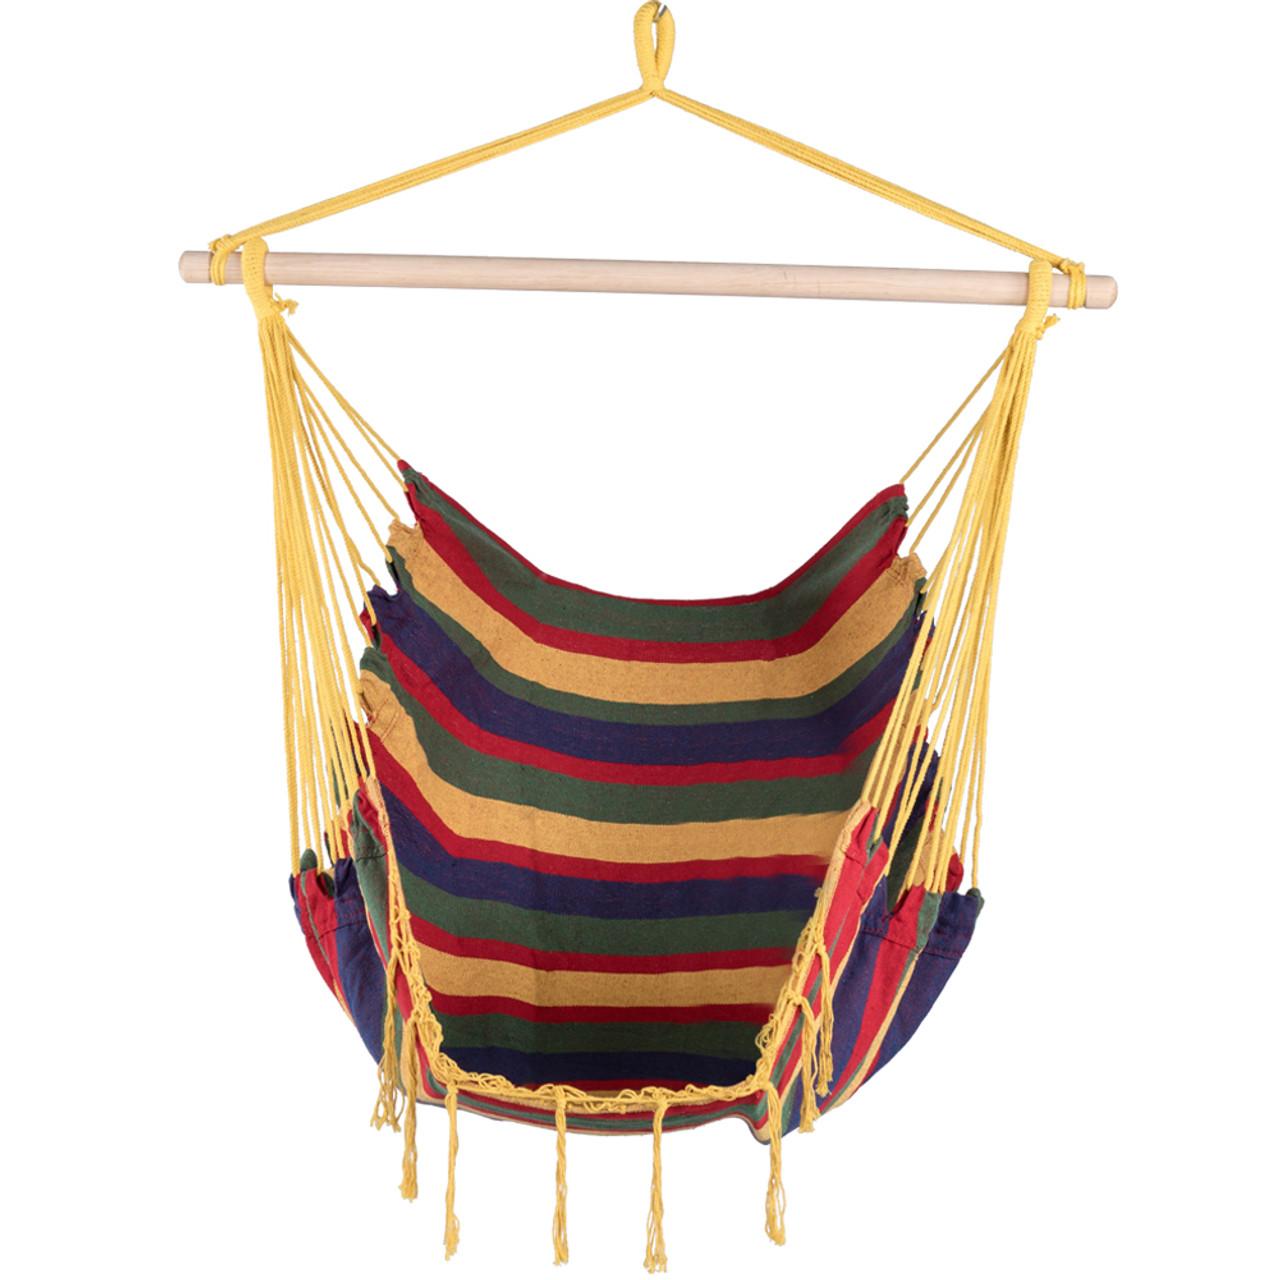 Lazy Daze Hammocks Canvas Hanging Hammock Swing Chair Seat With Wood  Spreader Bar (Tropical Stripe